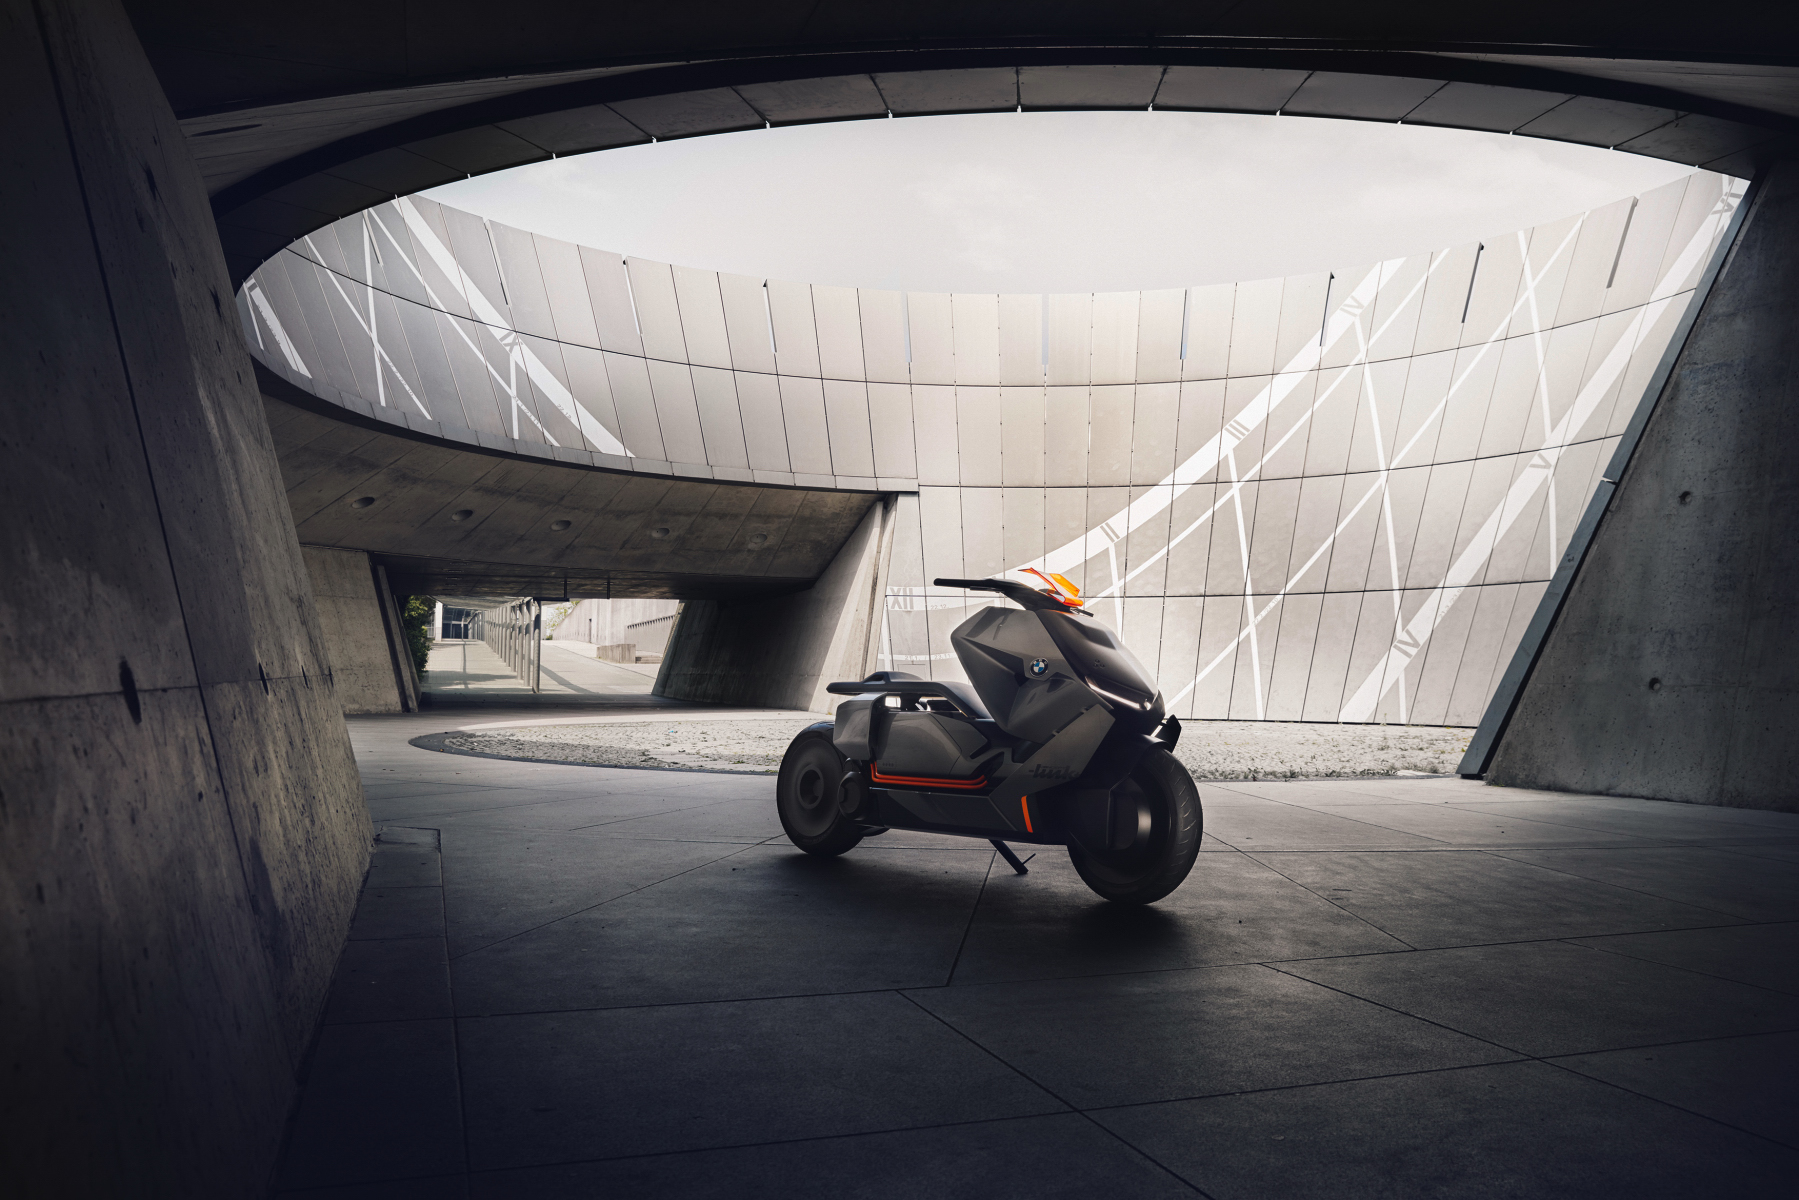 P90260578_highRes_bmw-motorrad-concept_01 拷貝.JPG